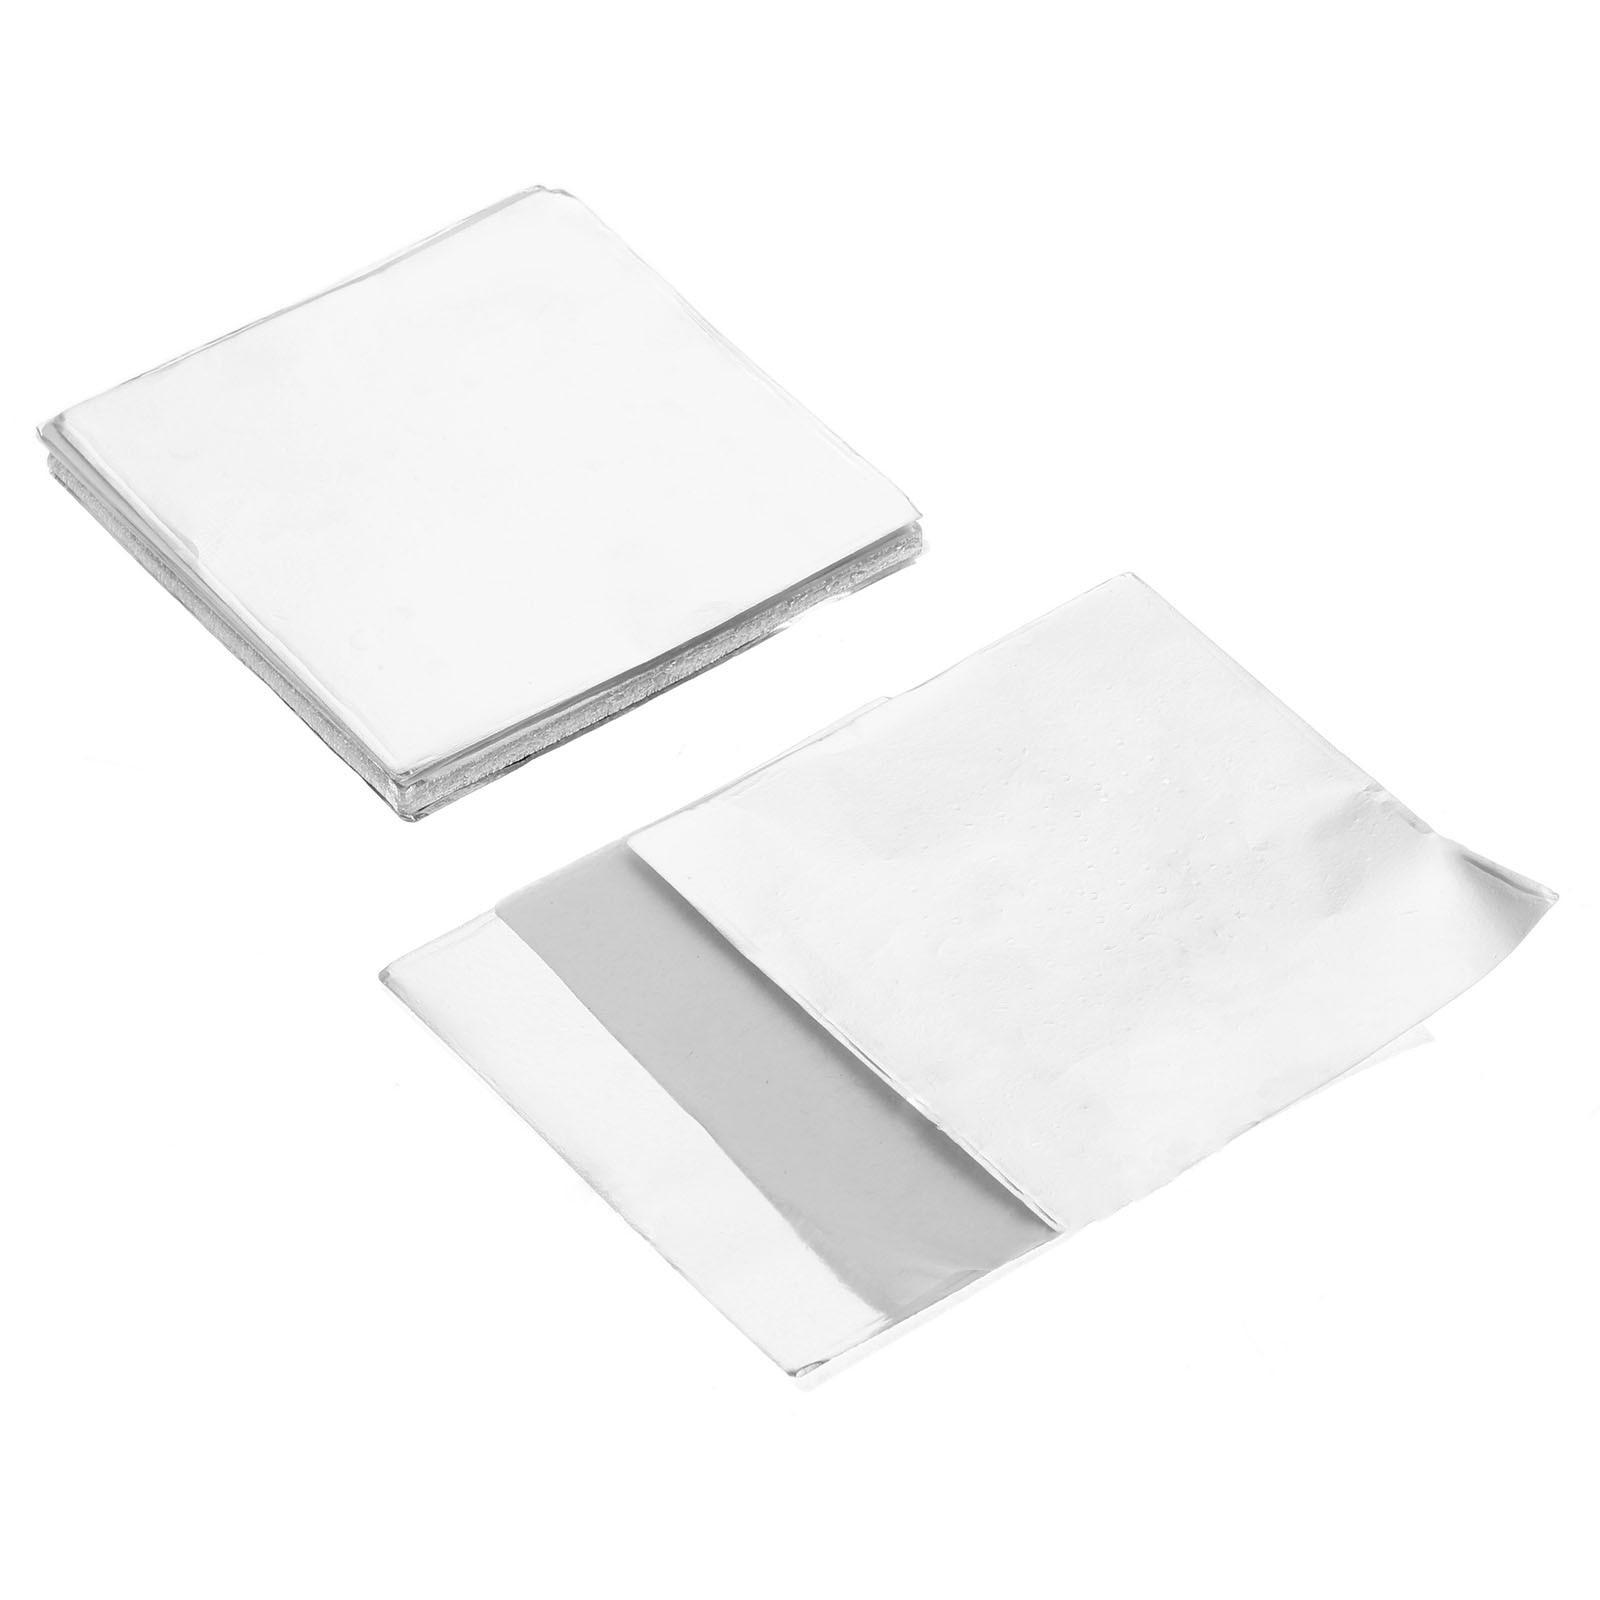 3/mm Enrollador de papel de aluminio